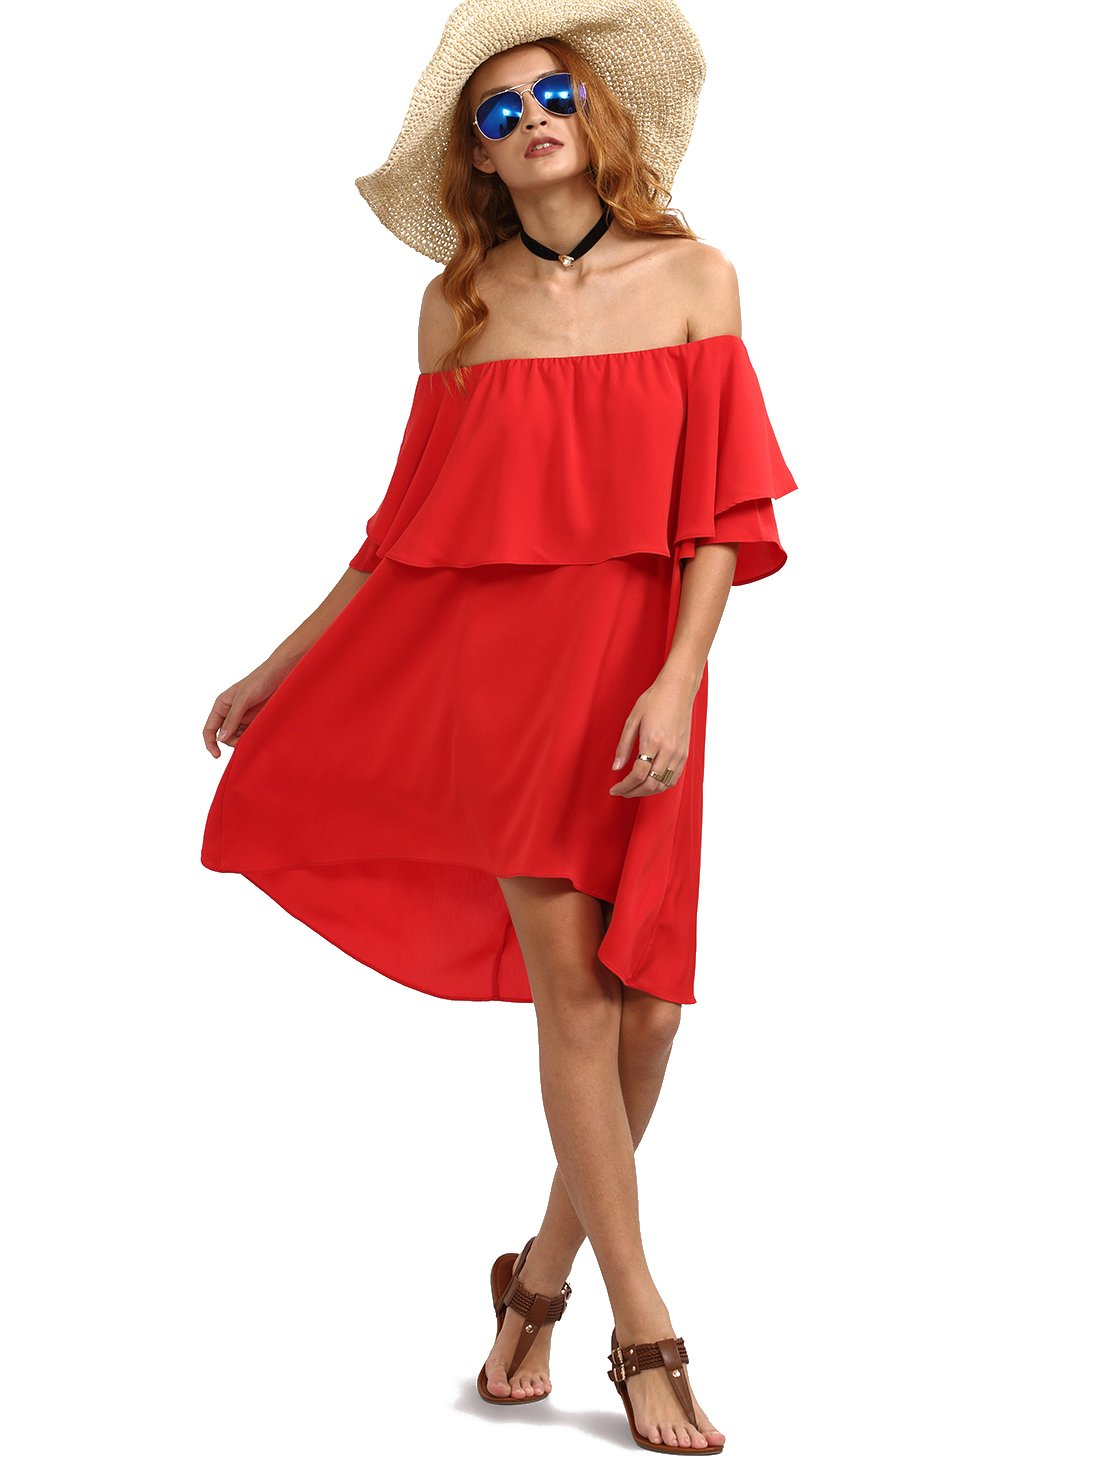 Romwe Women's Off The Shoulder Ruffle Casual Loose Shift Dress Red S